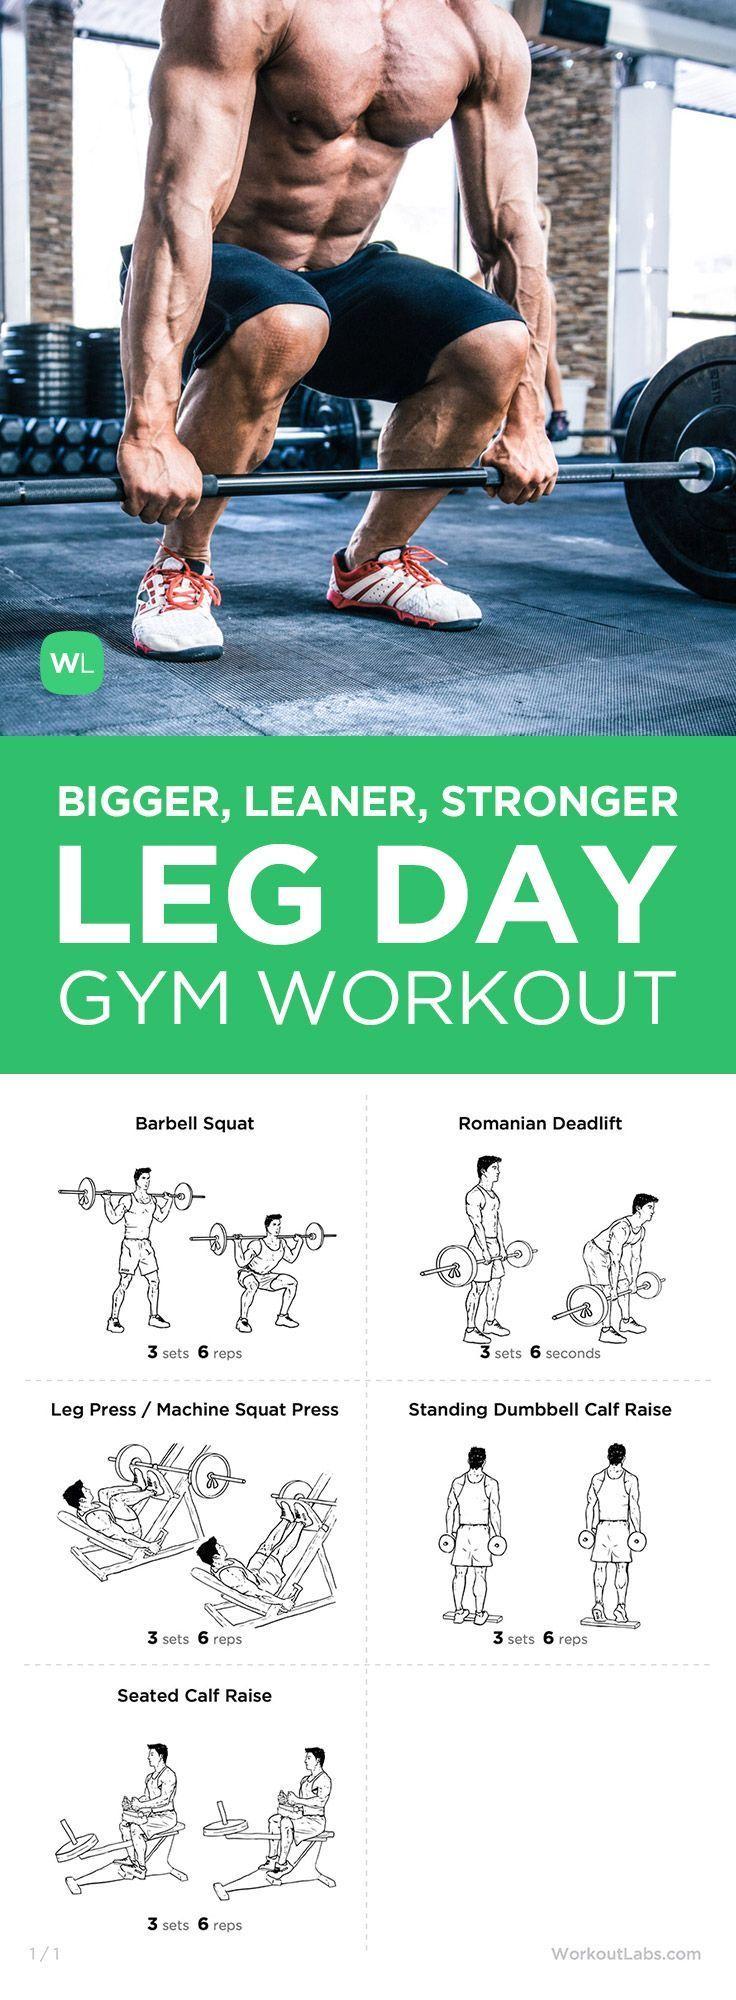 Free PDF Mike Matthews Bigger Leaner Stronger Leg Day Workout For Men